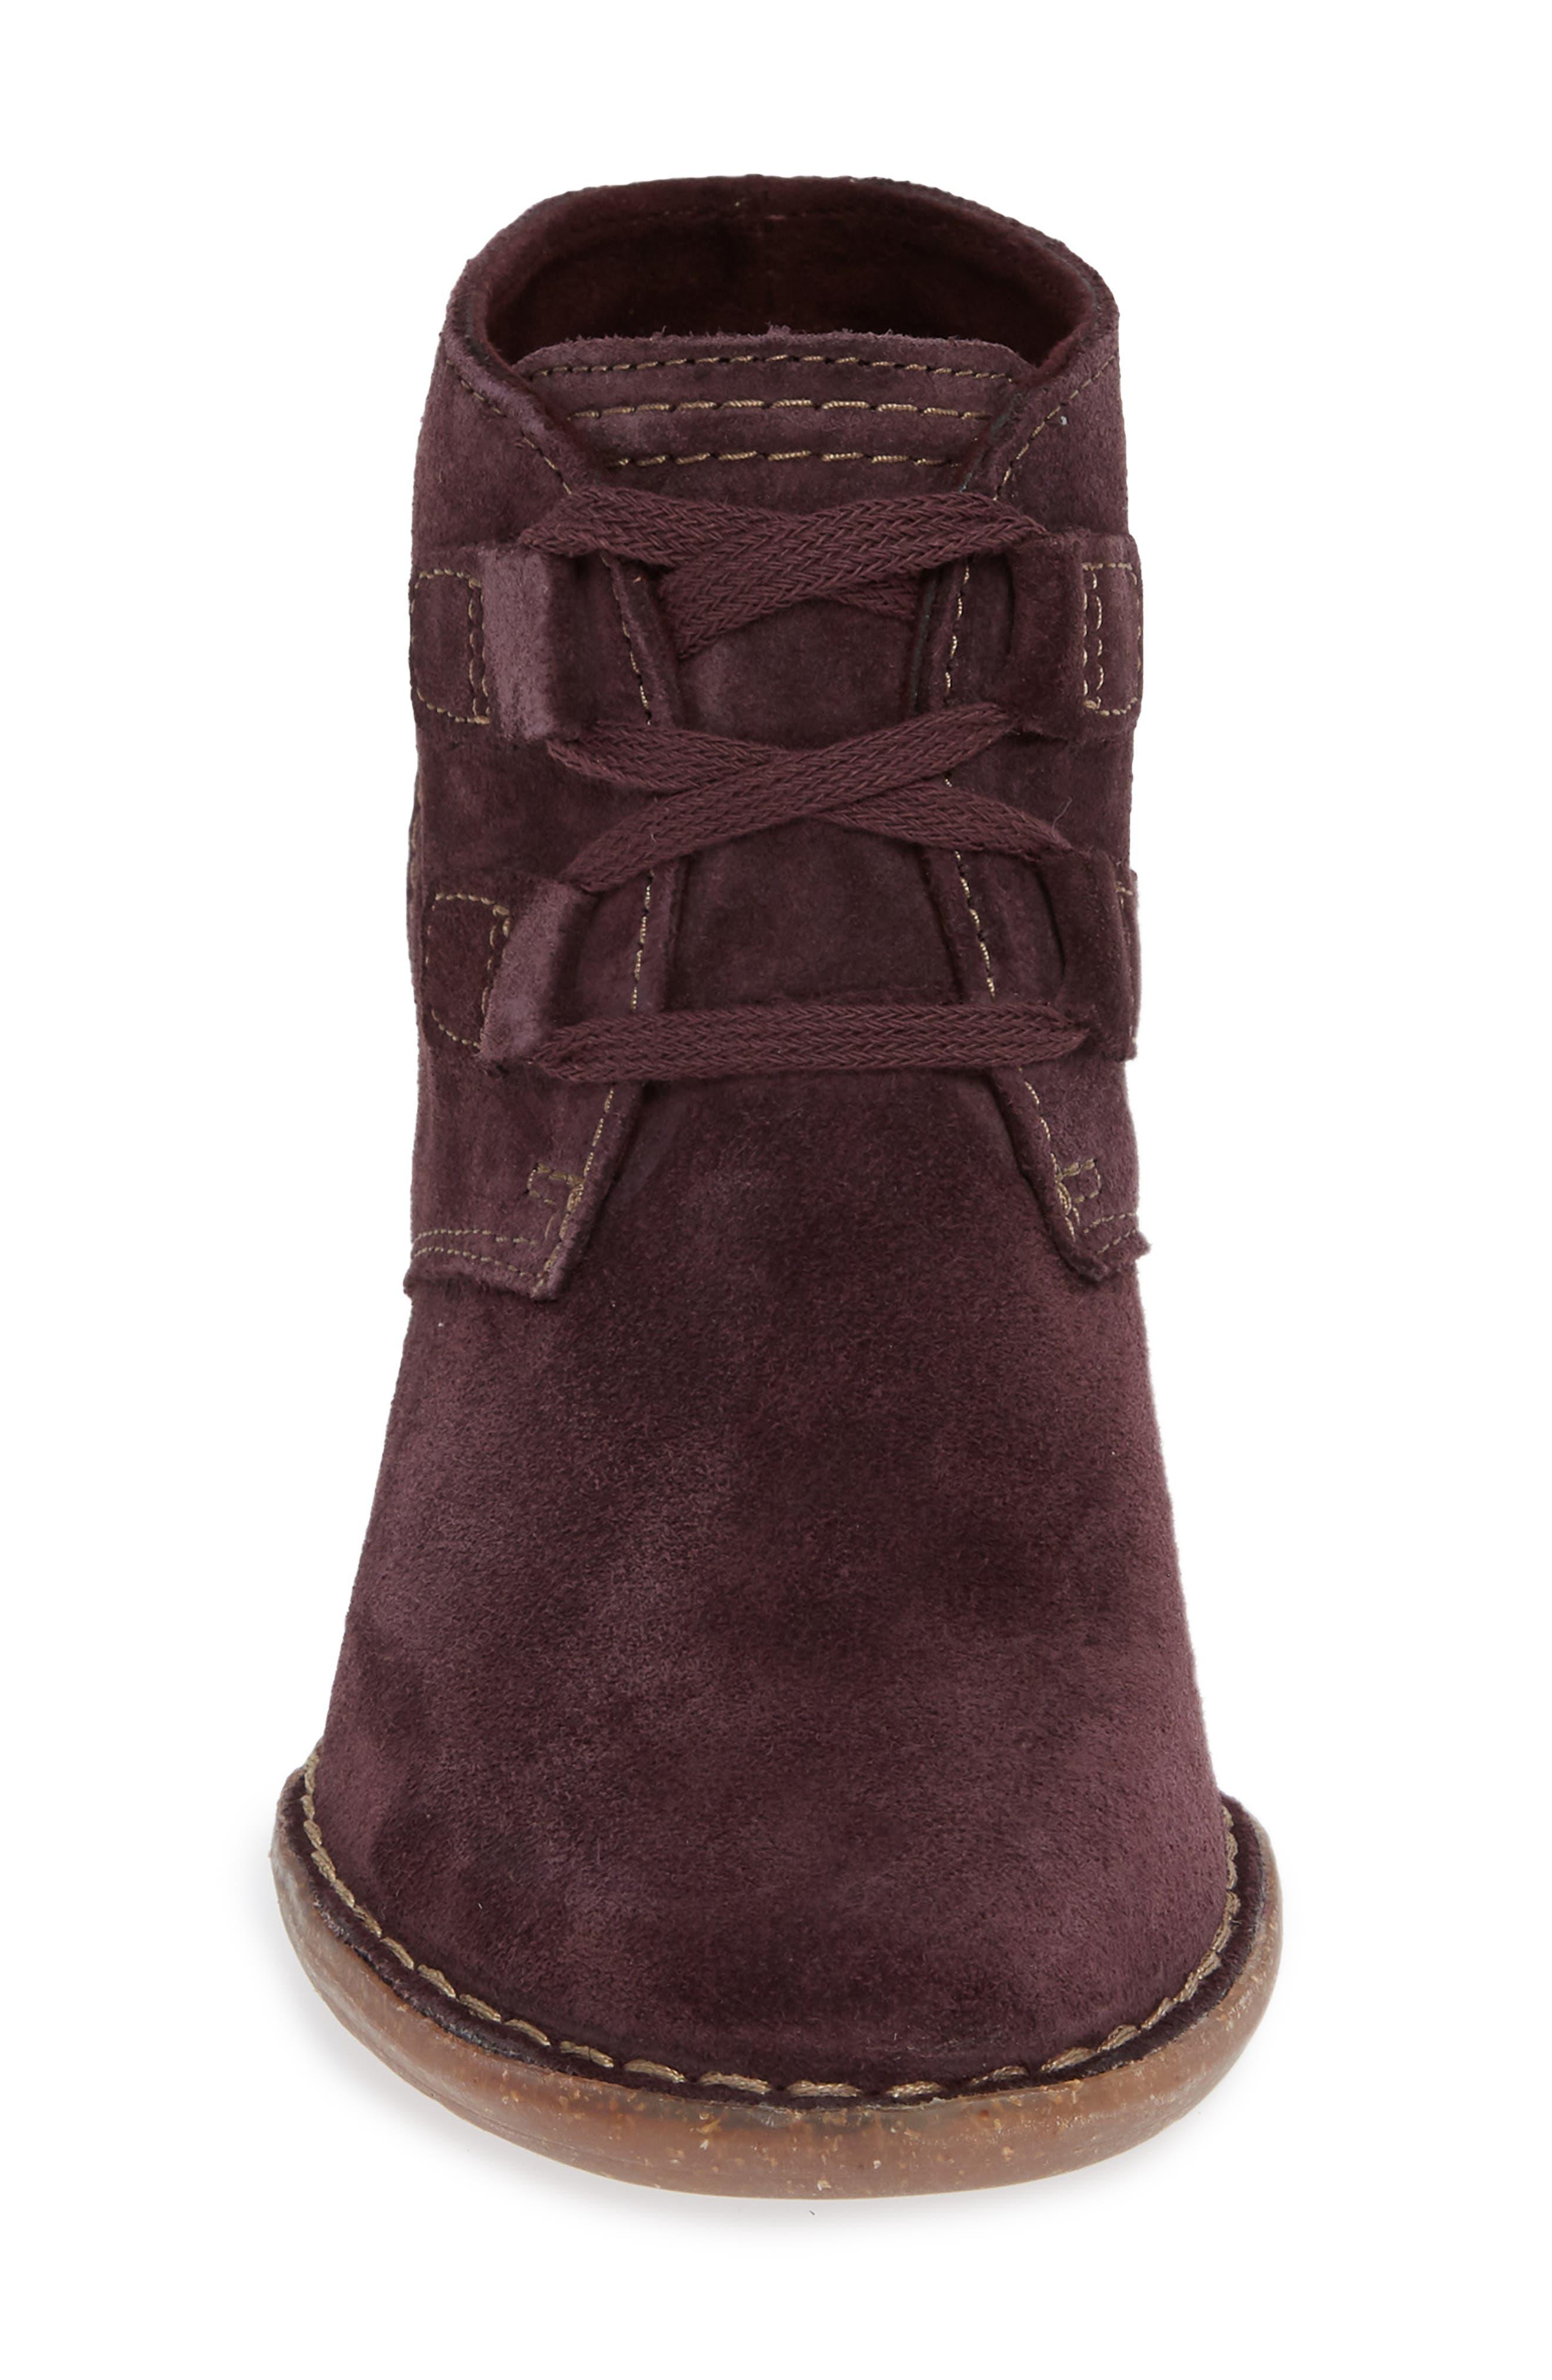 'Carleta Lyon' Ankle Boot,                             Alternate thumbnail 4, color,                             AUBERGINE SUEDE